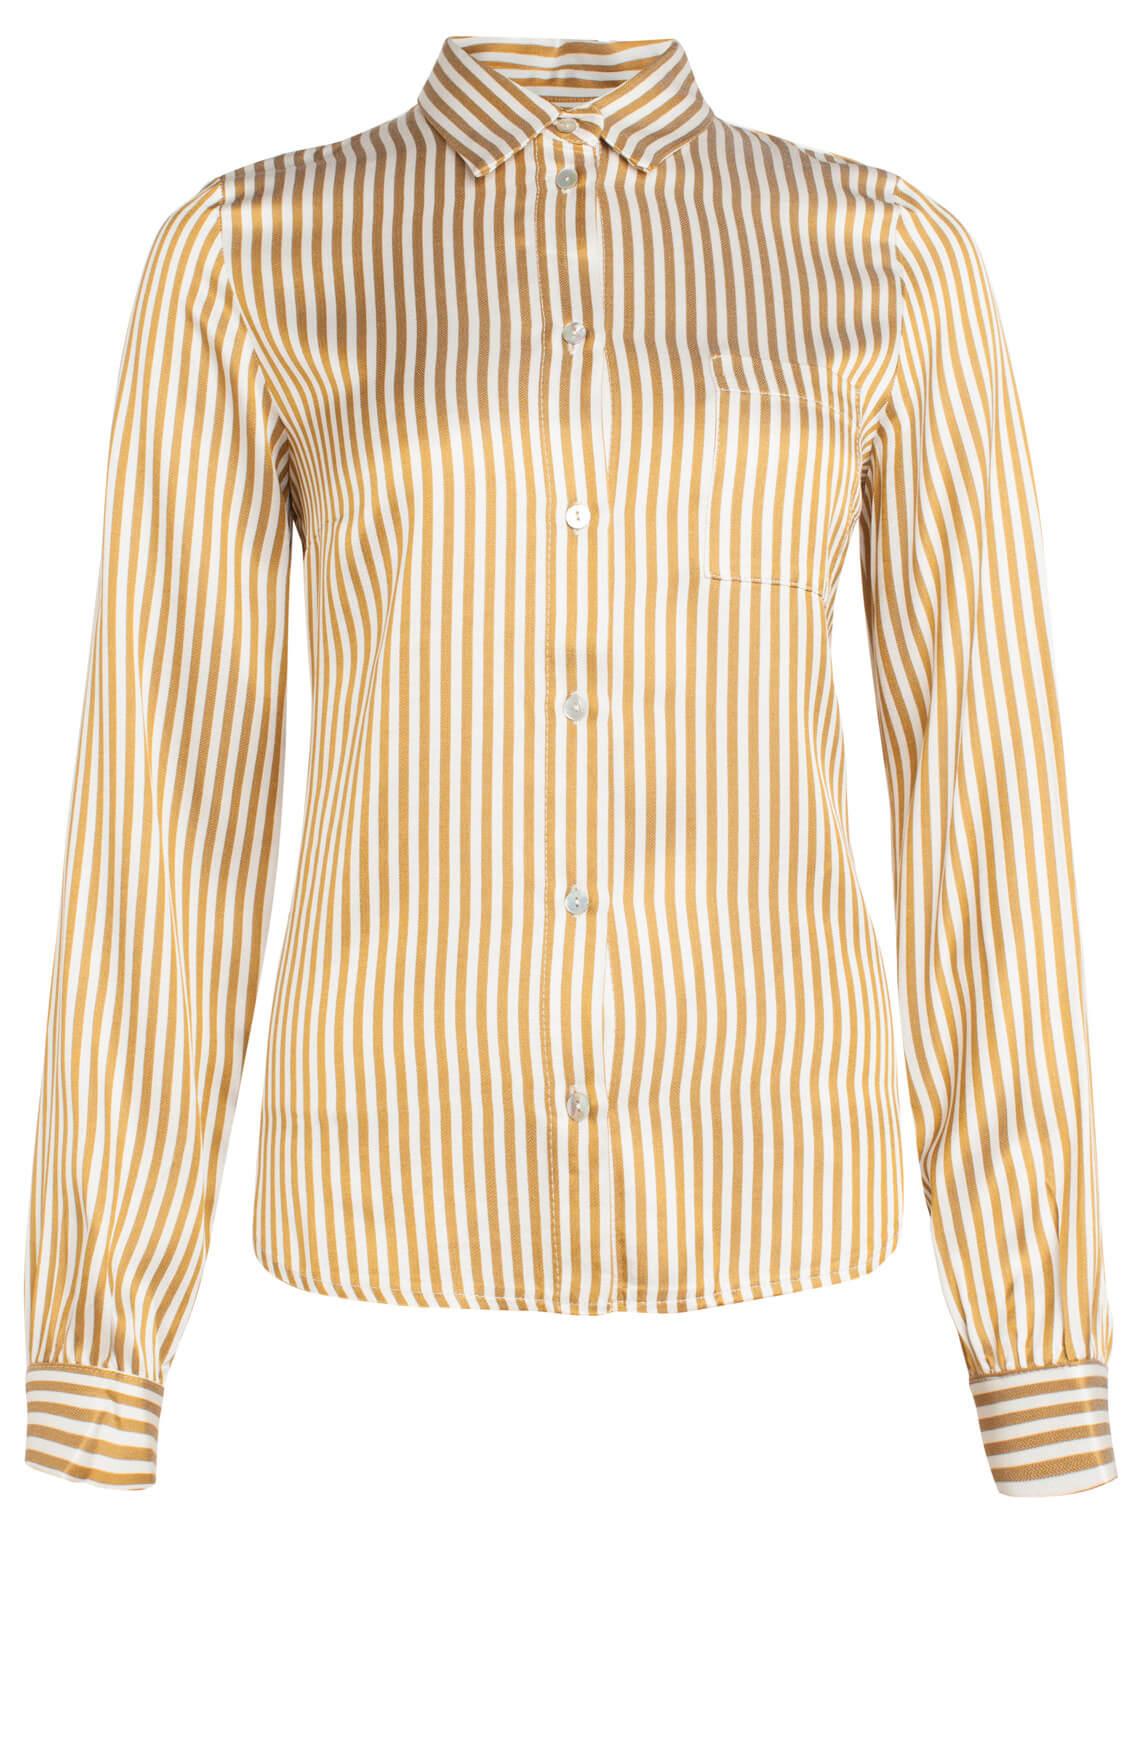 By-Bar Dames Zoe gestreepte blouse geel